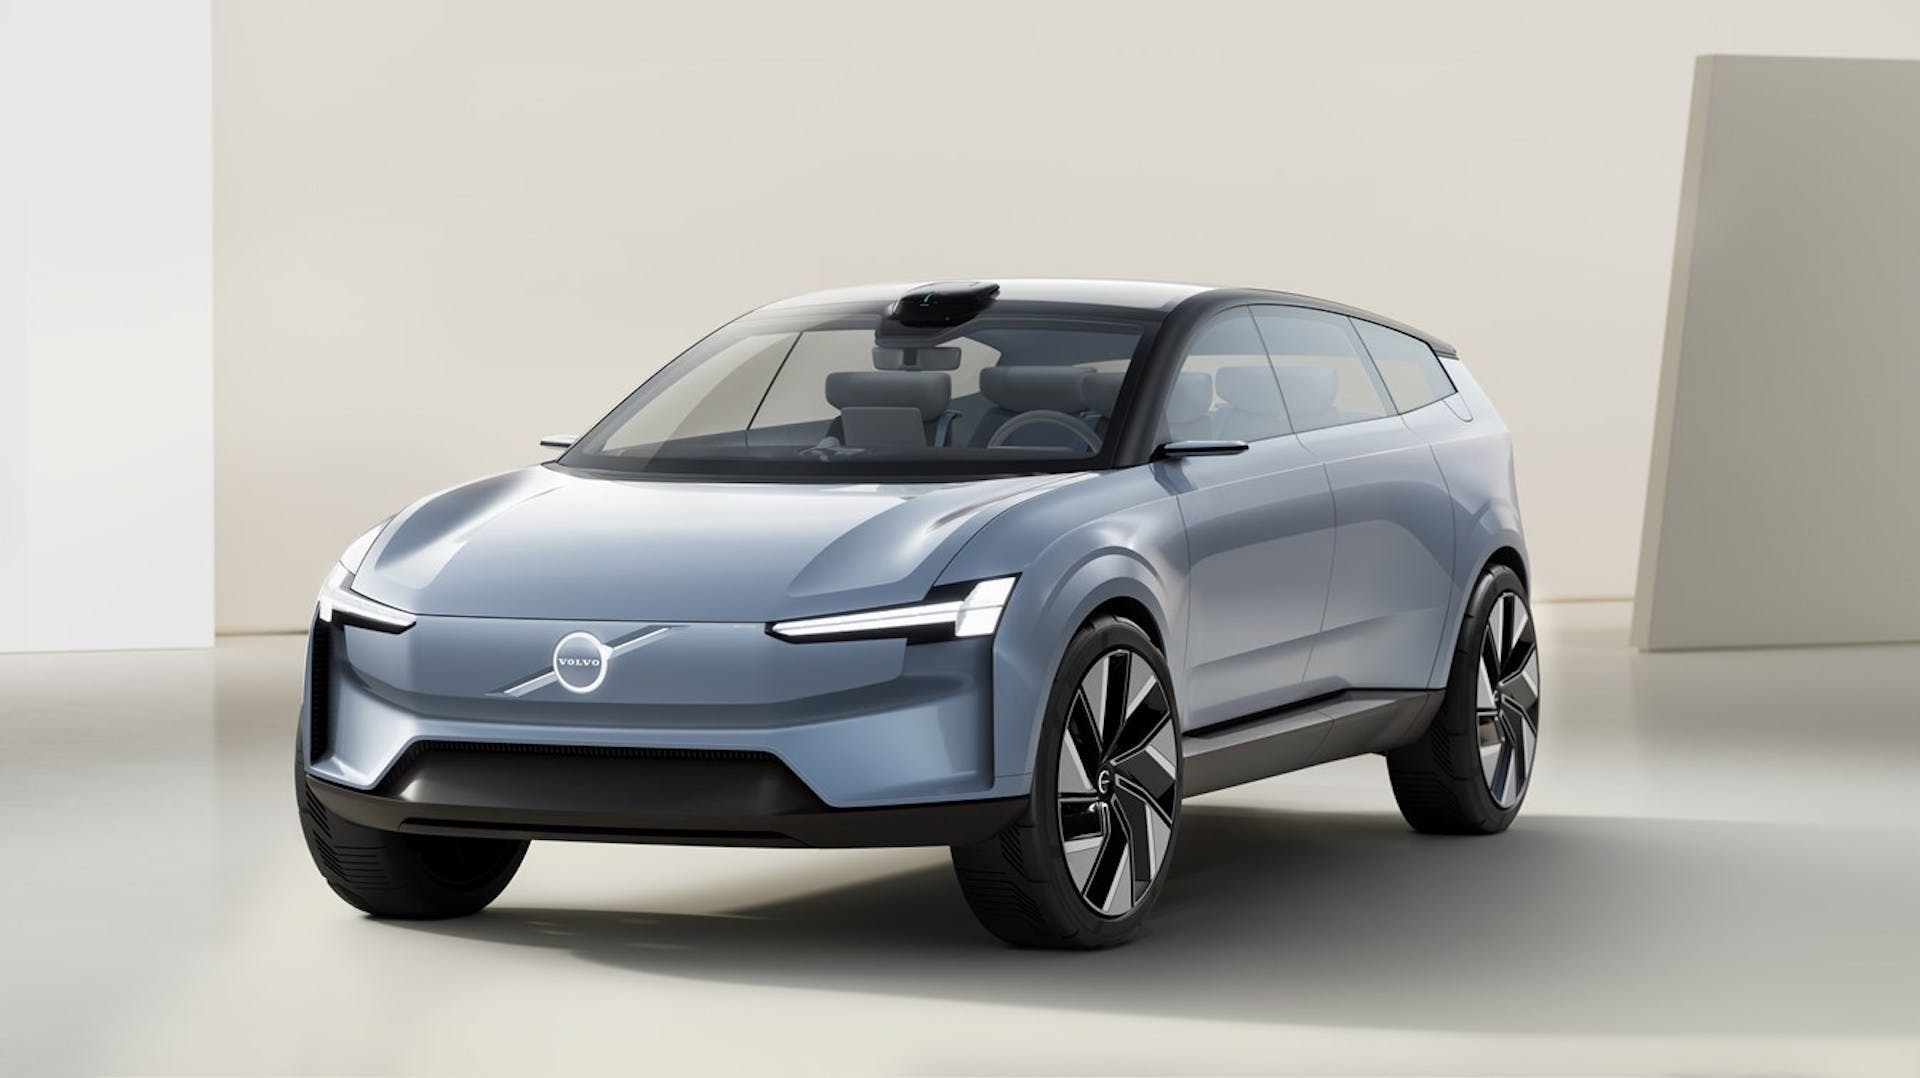 Volvo Concept Recharge - foto studio tre quarti anteriore